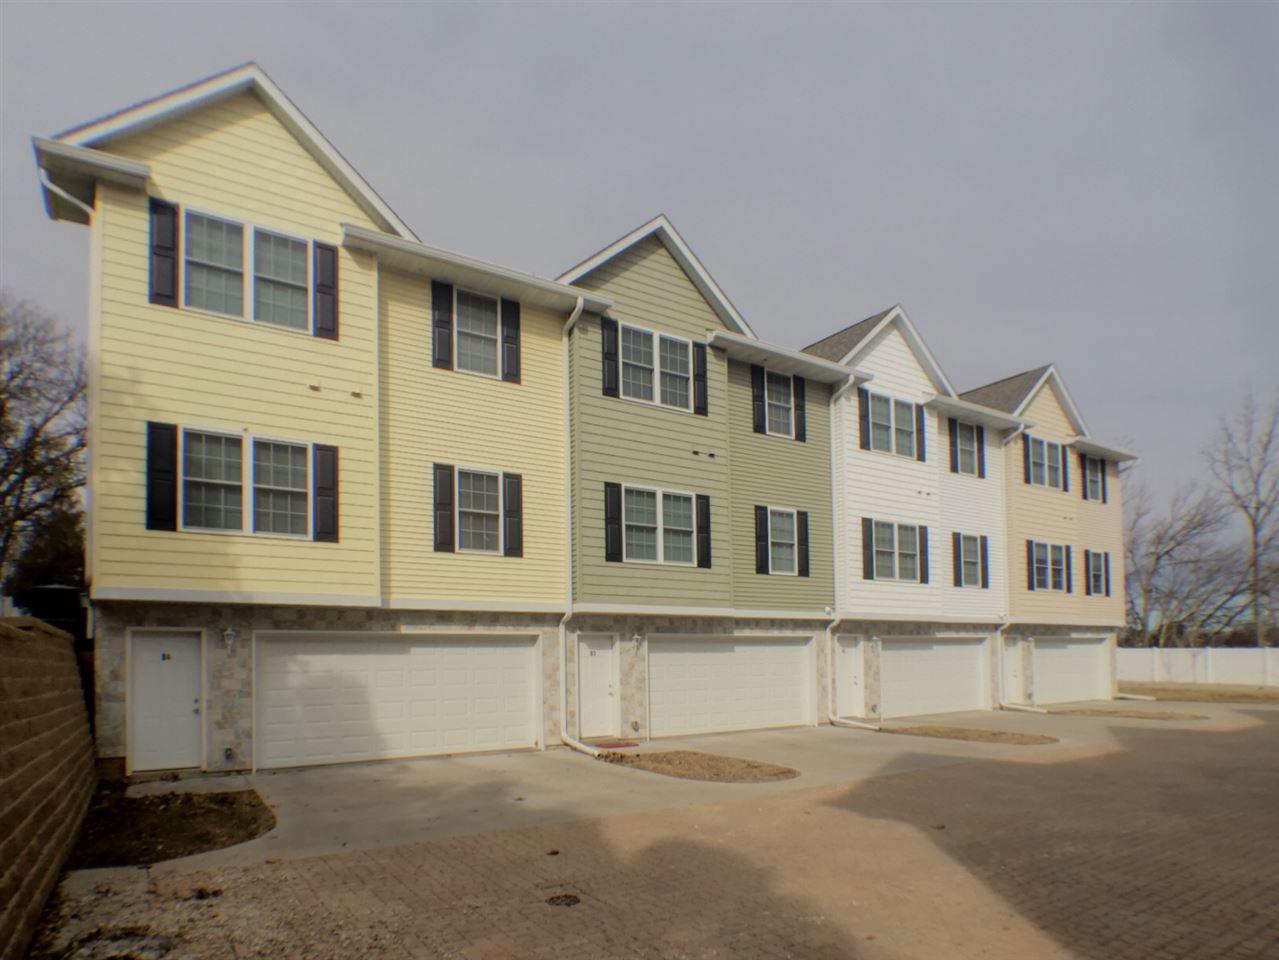 Rental Homes for Rent, ListingId:32780260, location: 220 E 37TH Street Davenport 52806